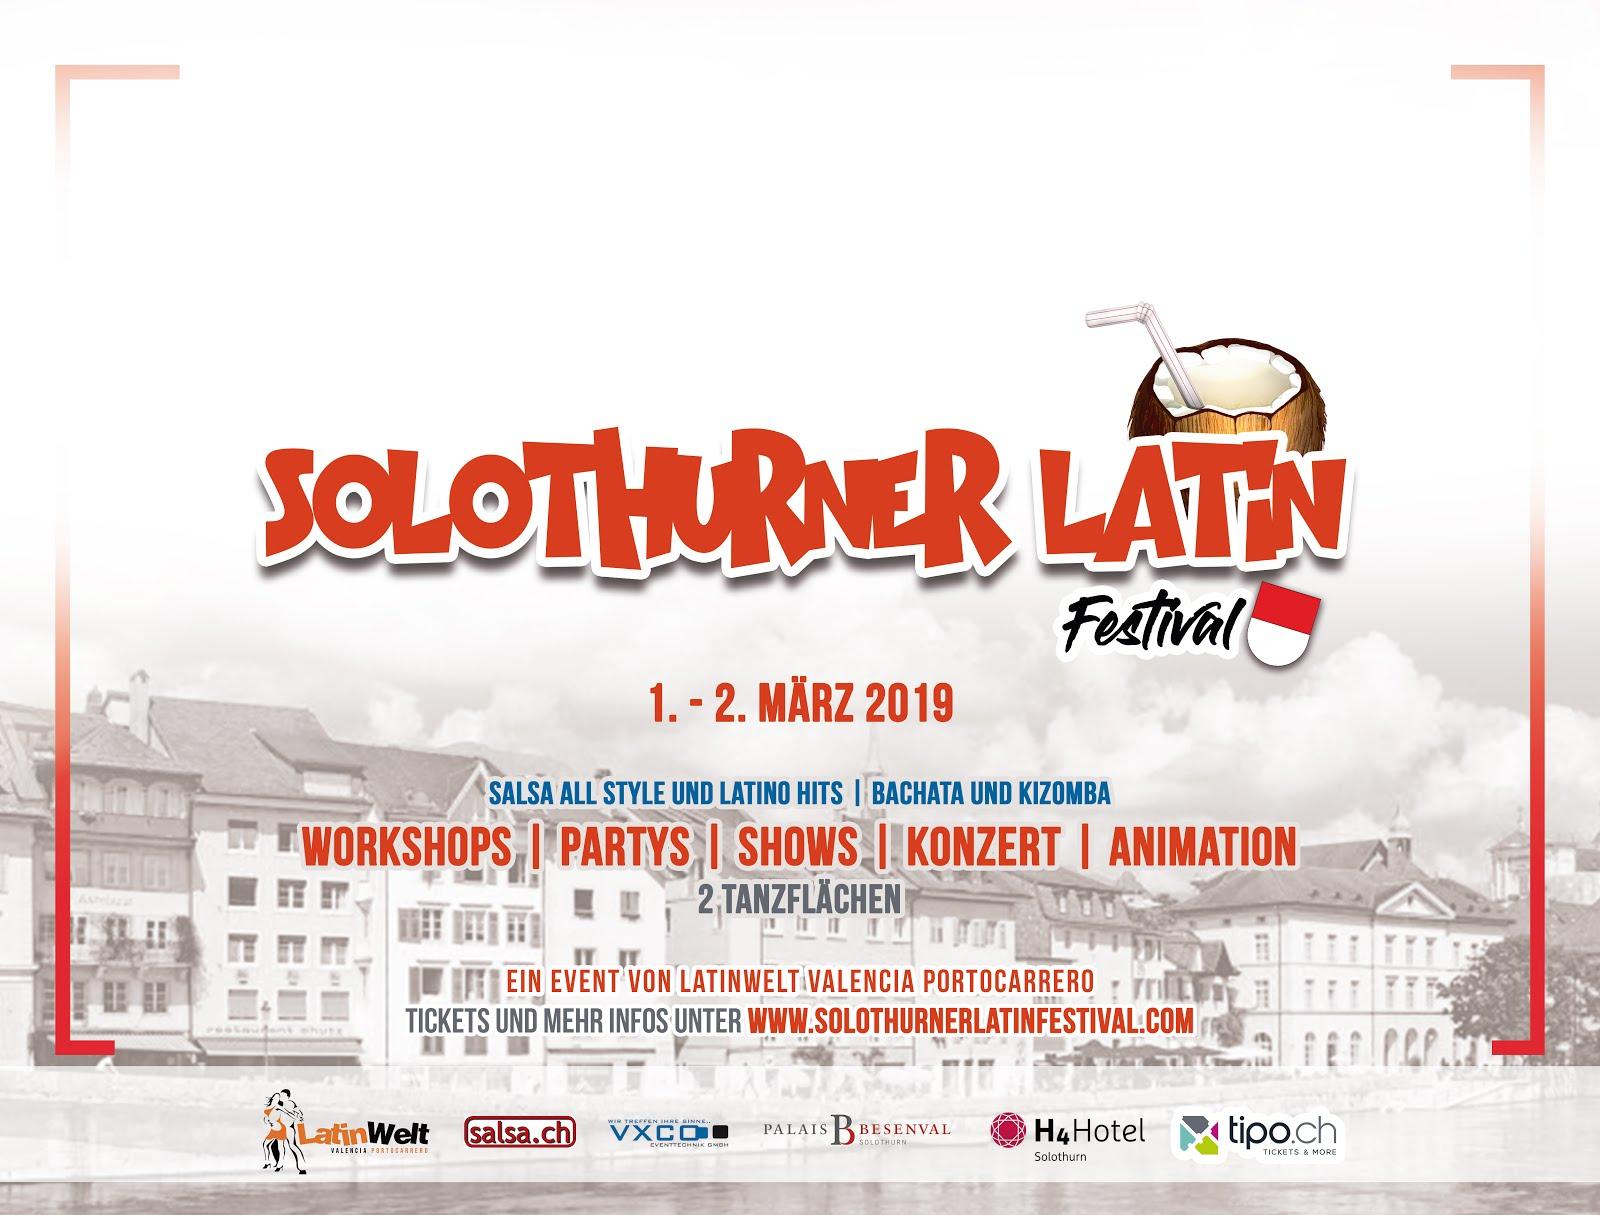 Solothurner Latin Festival 2019